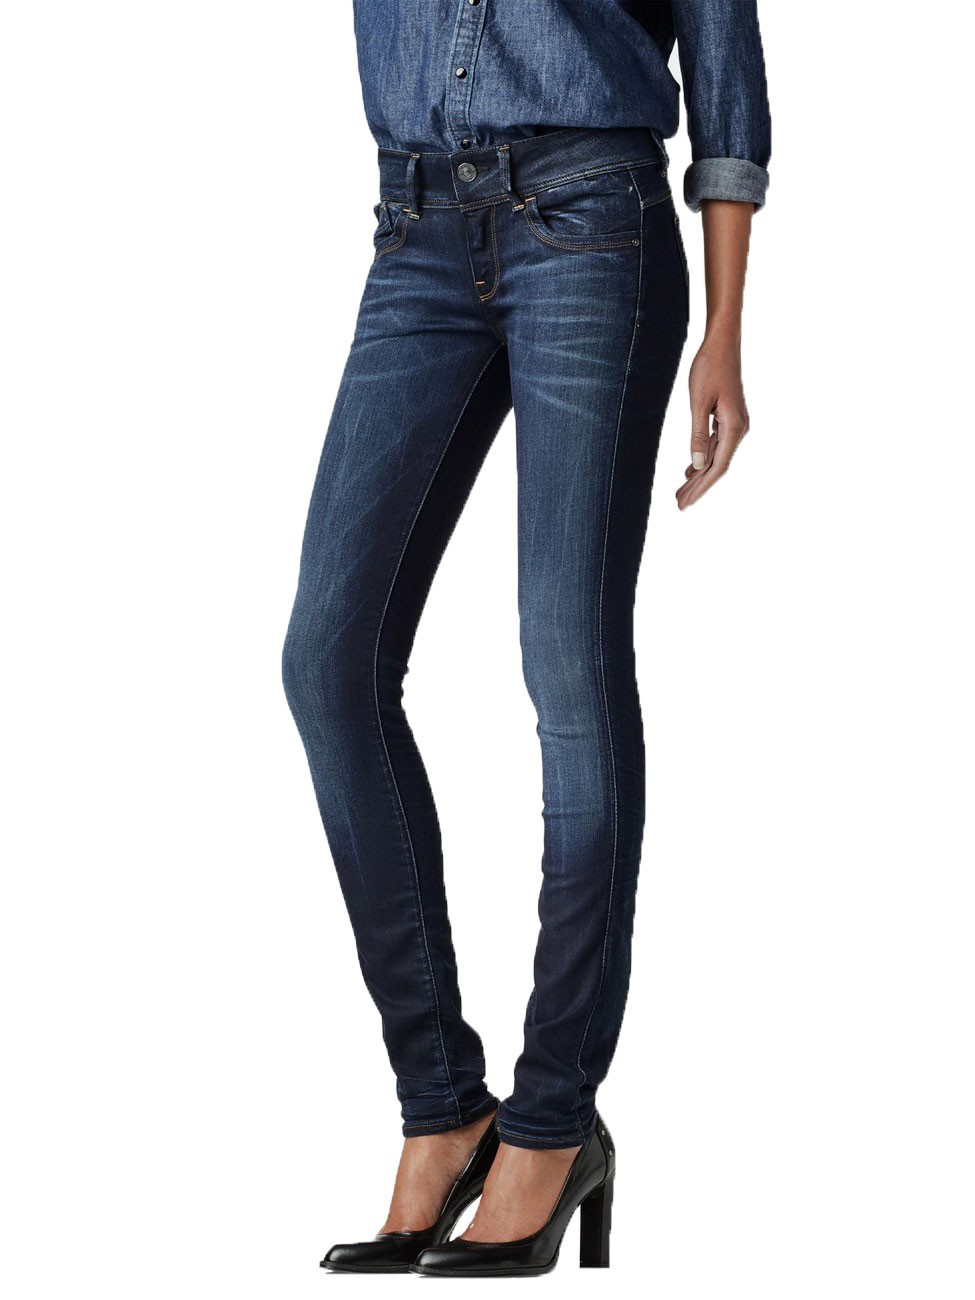 g star damen jeans lynn mid waist skinny fit blau medium aged ebay. Black Bedroom Furniture Sets. Home Design Ideas